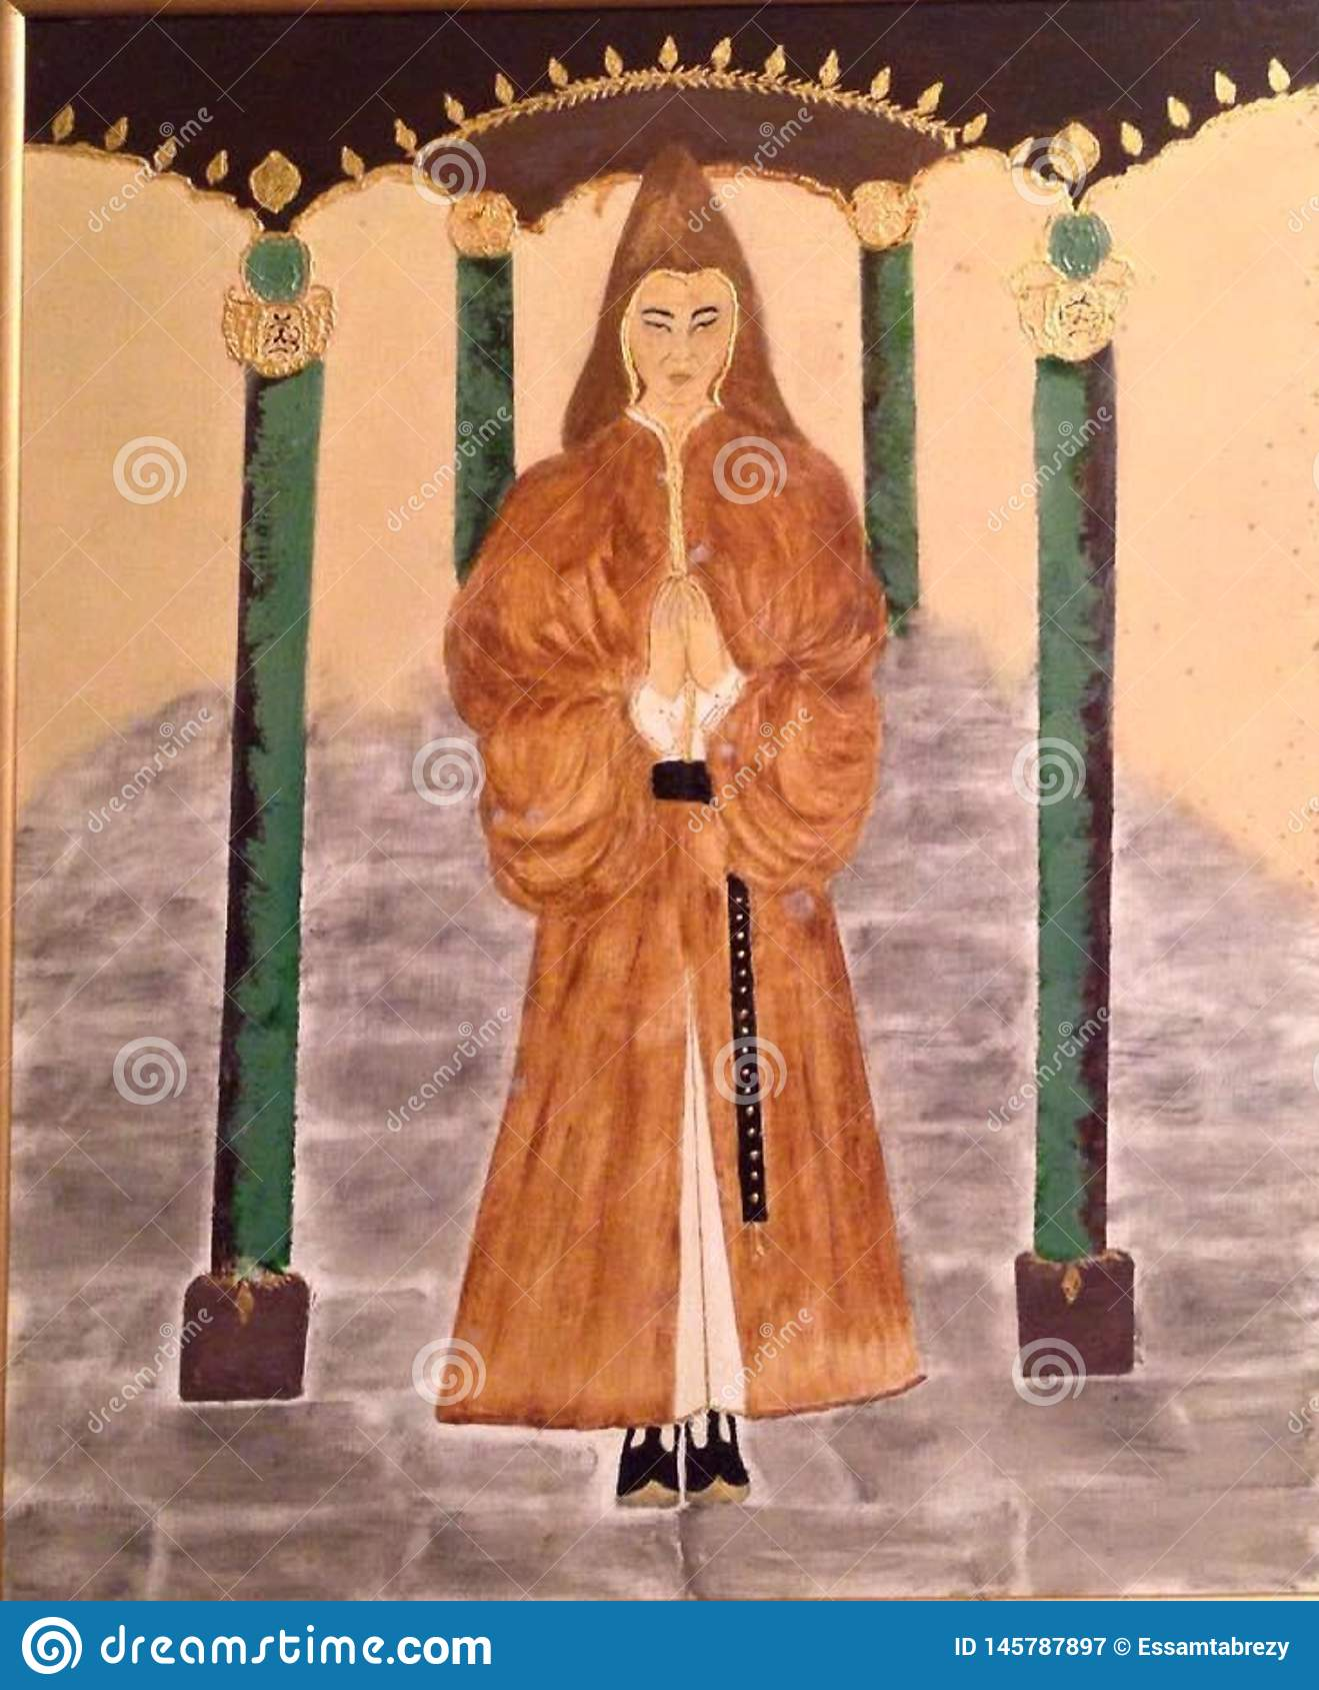 Priester, Heilige, Tempel Heilige mens, vrome Mens Met een kap,